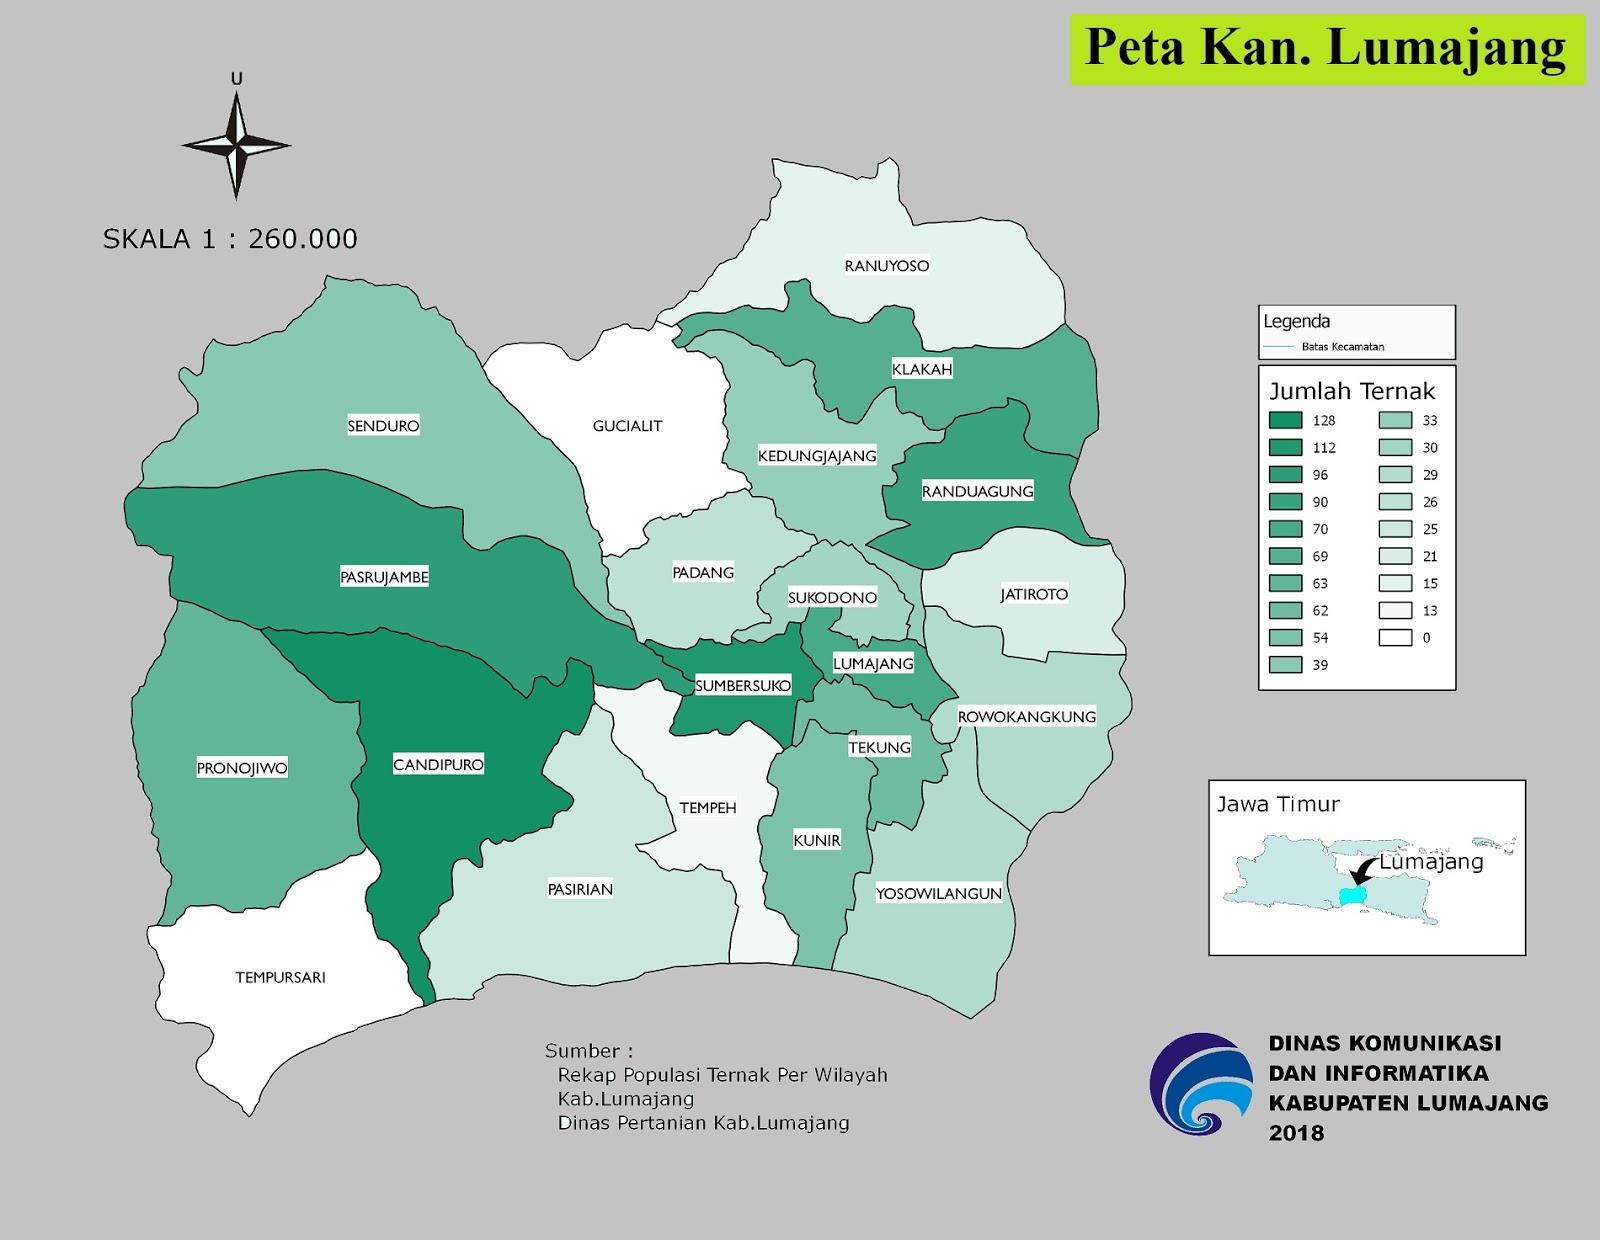 Peta Kabupaten Lumajang